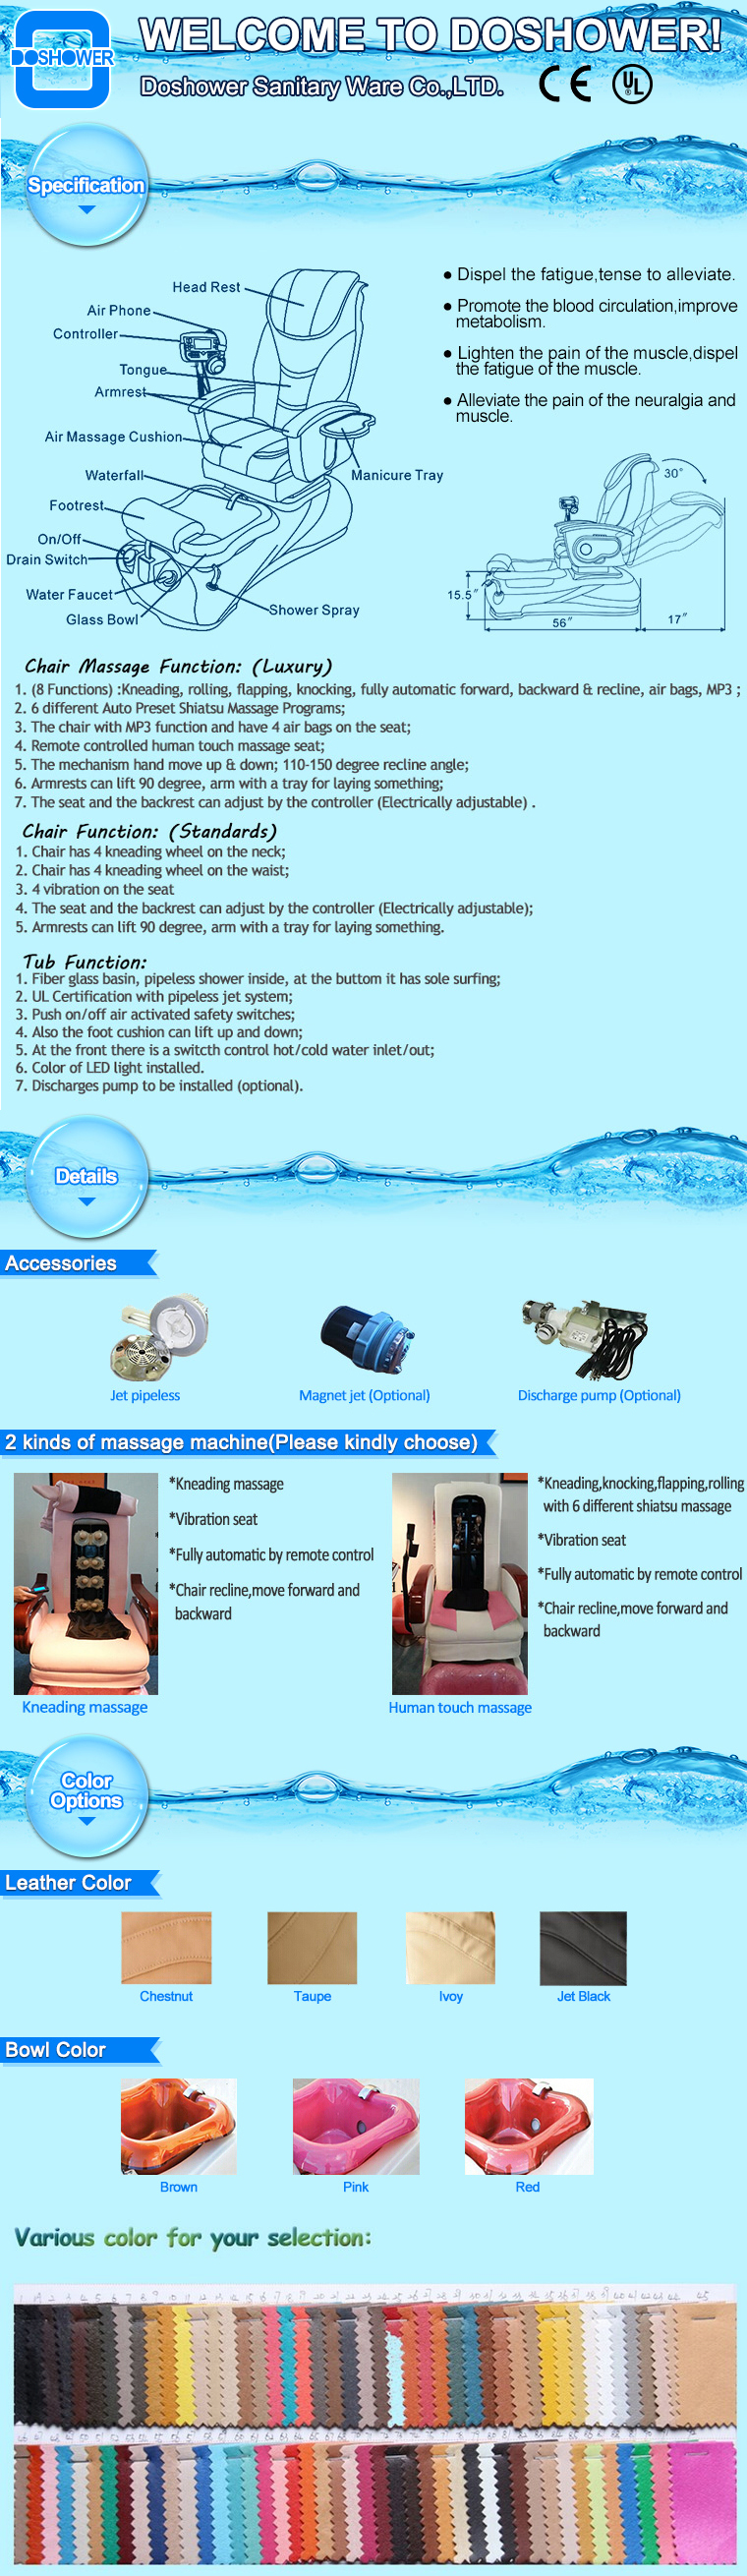 Pediküre becken liner mit kunststoff spa liner für pipeless pediküre spa stuhl